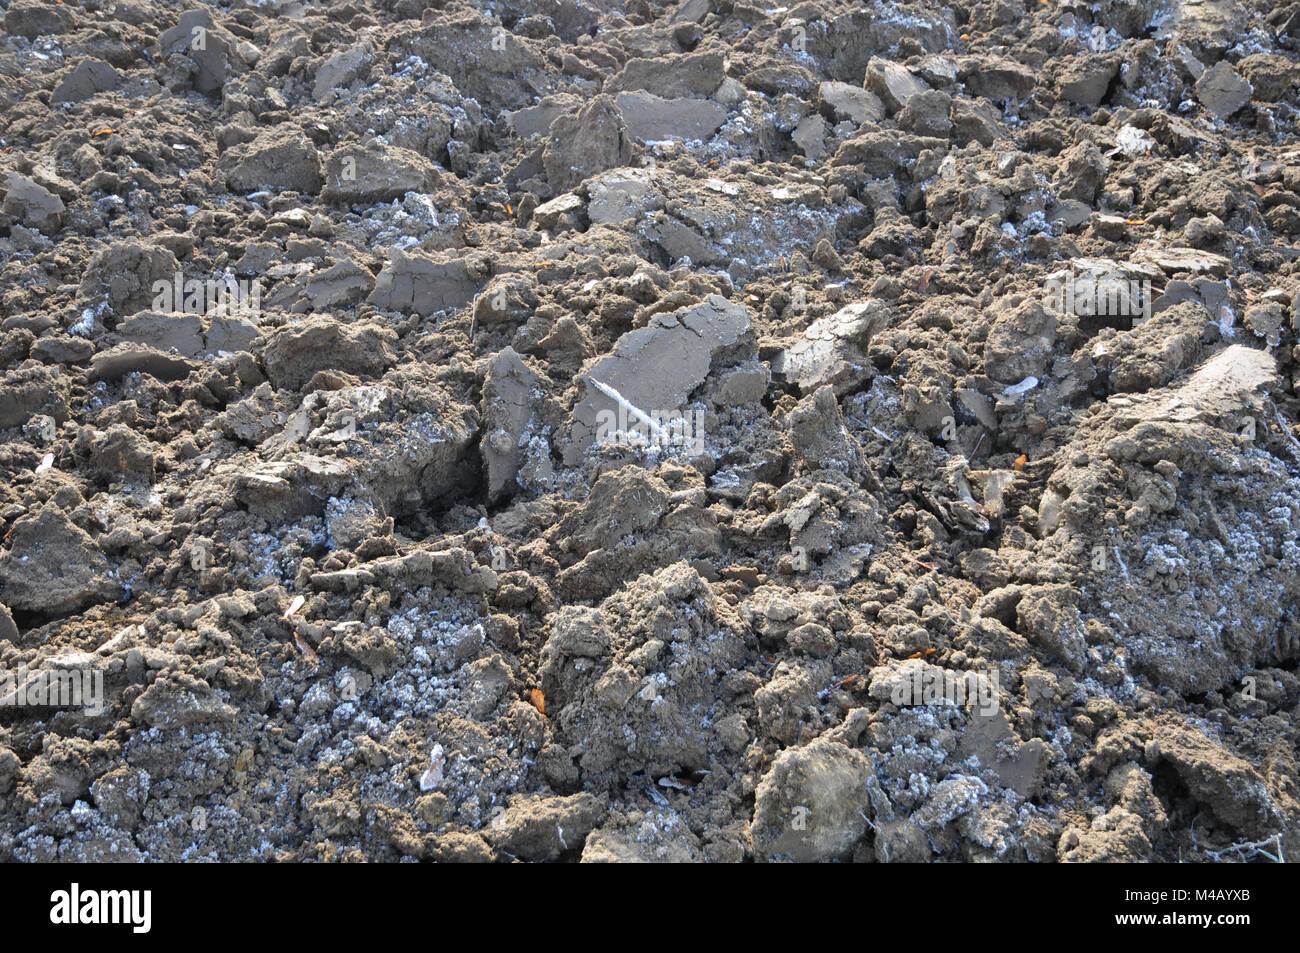 soil frost stockfotos soil frost bilder alamy. Black Bedroom Furniture Sets. Home Design Ideas